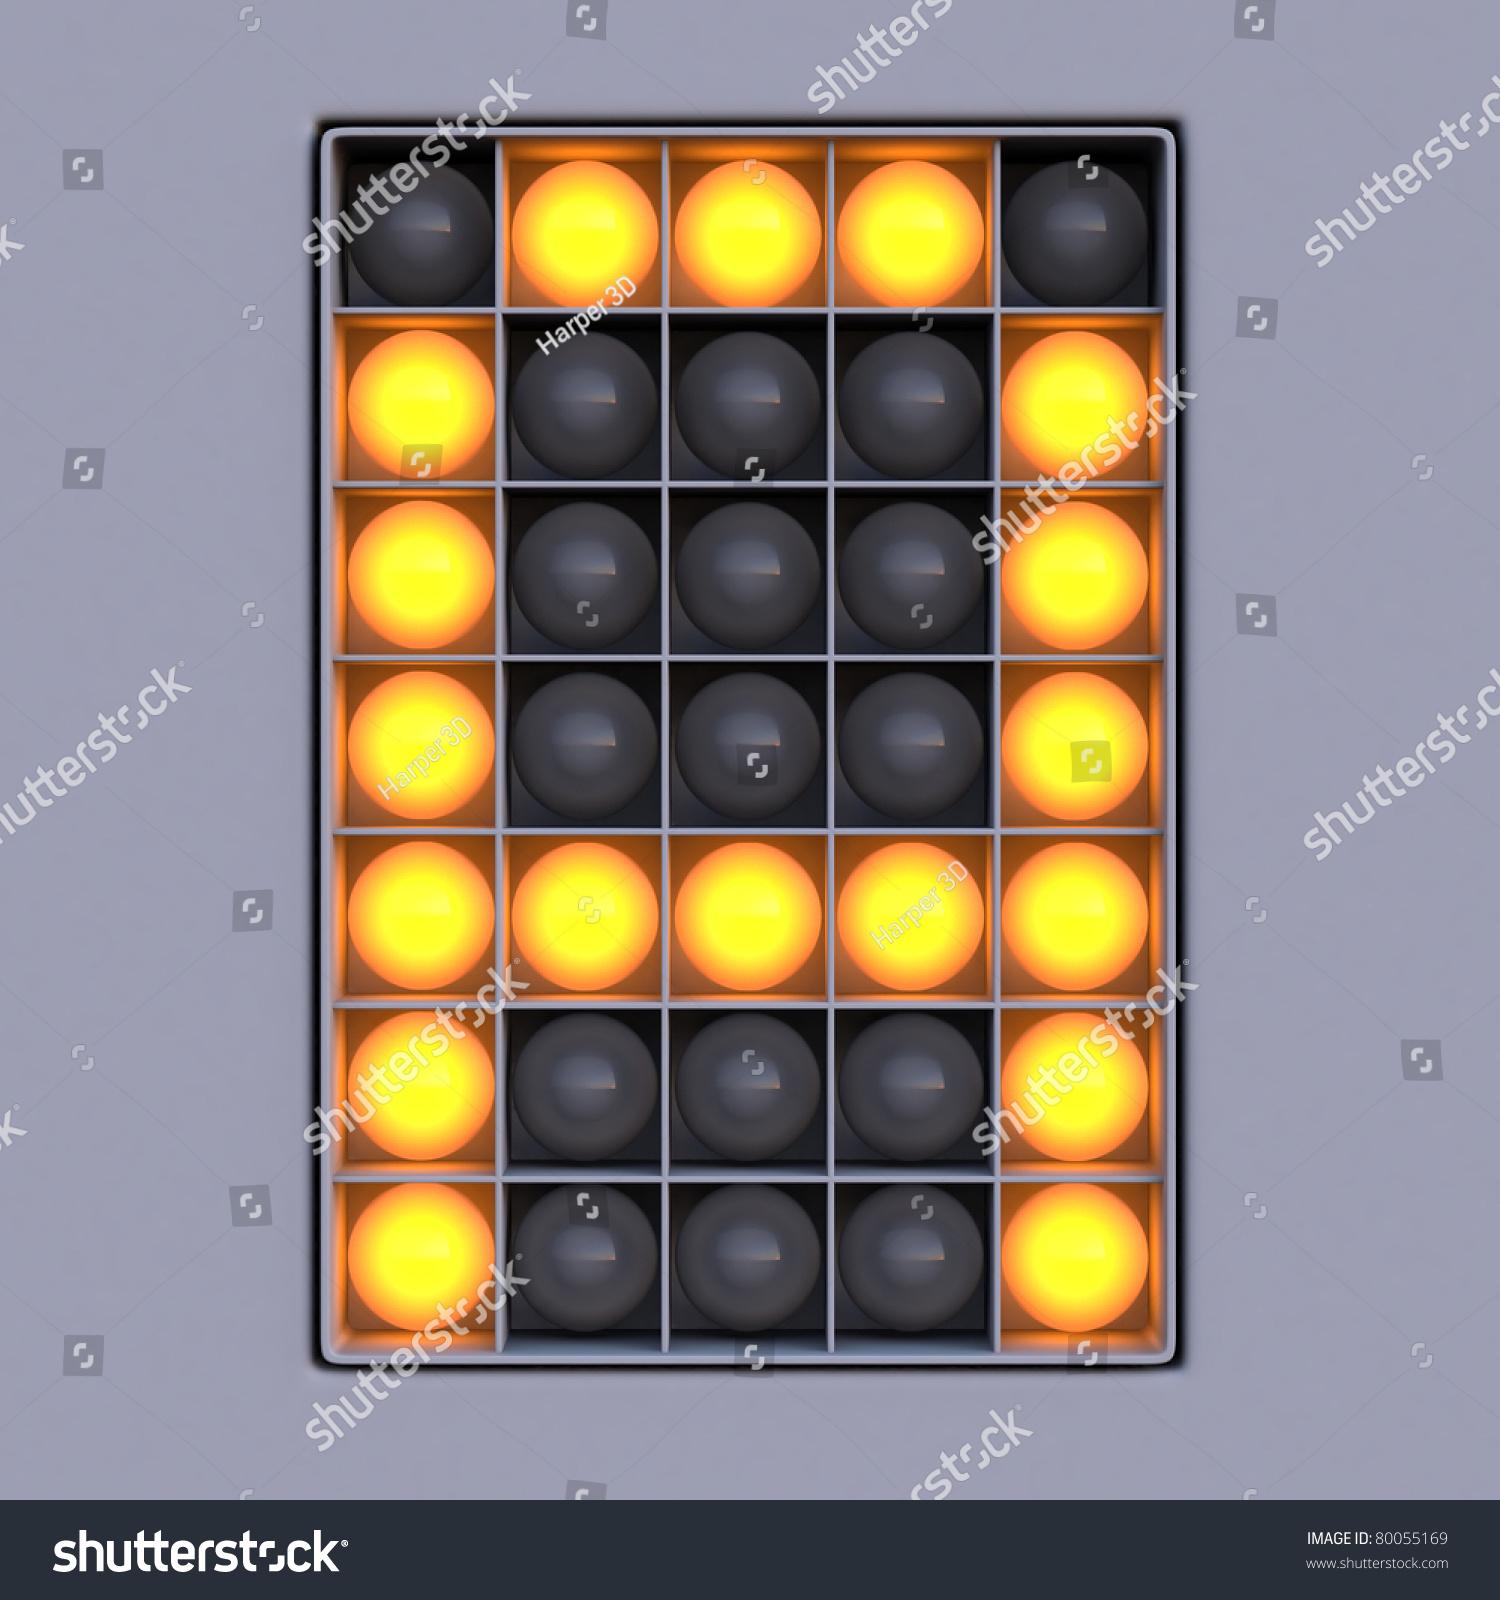 Diode Images Stock Photos Vectors Shutterstock Electronic Circuit Symbols Vector Illustration 1445110 Letter Scoreboard Alphabet 5x7 Lights